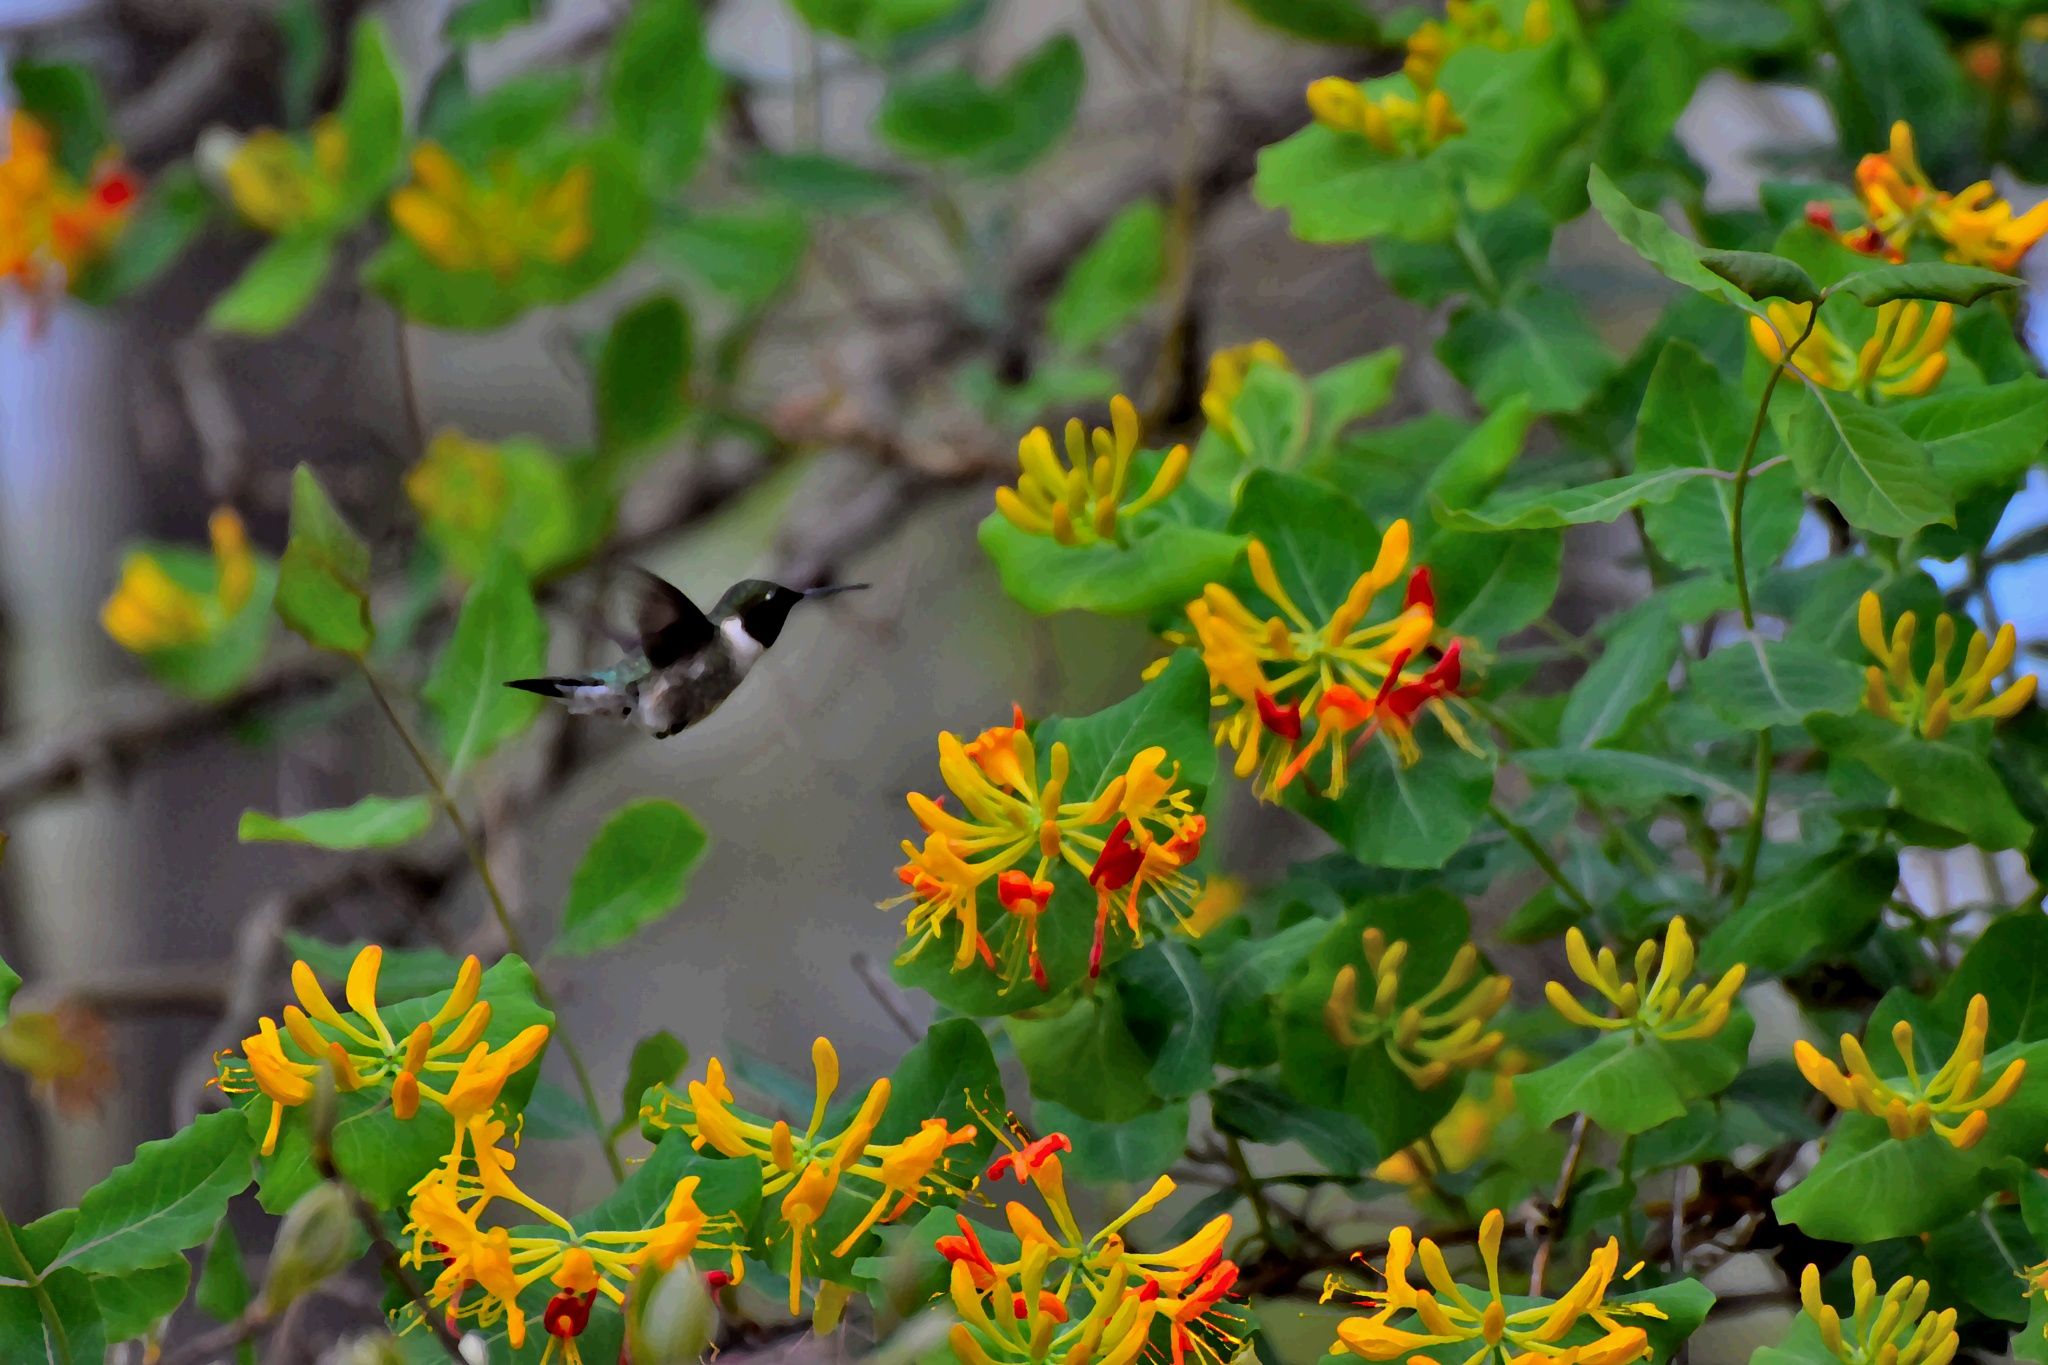 Digital Art 104~Honeysuckle And The Hummingbird 2 by Lawrence Scott Hess